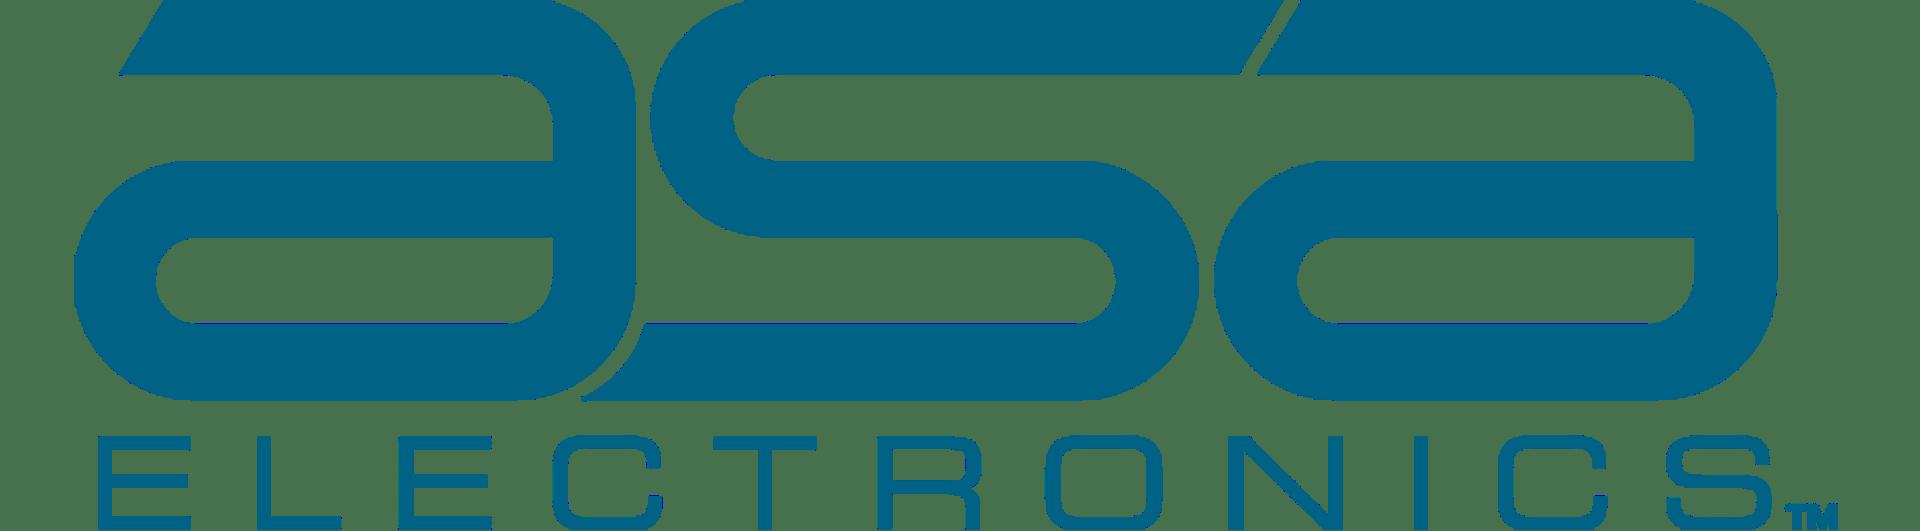 ASA Electronics logo